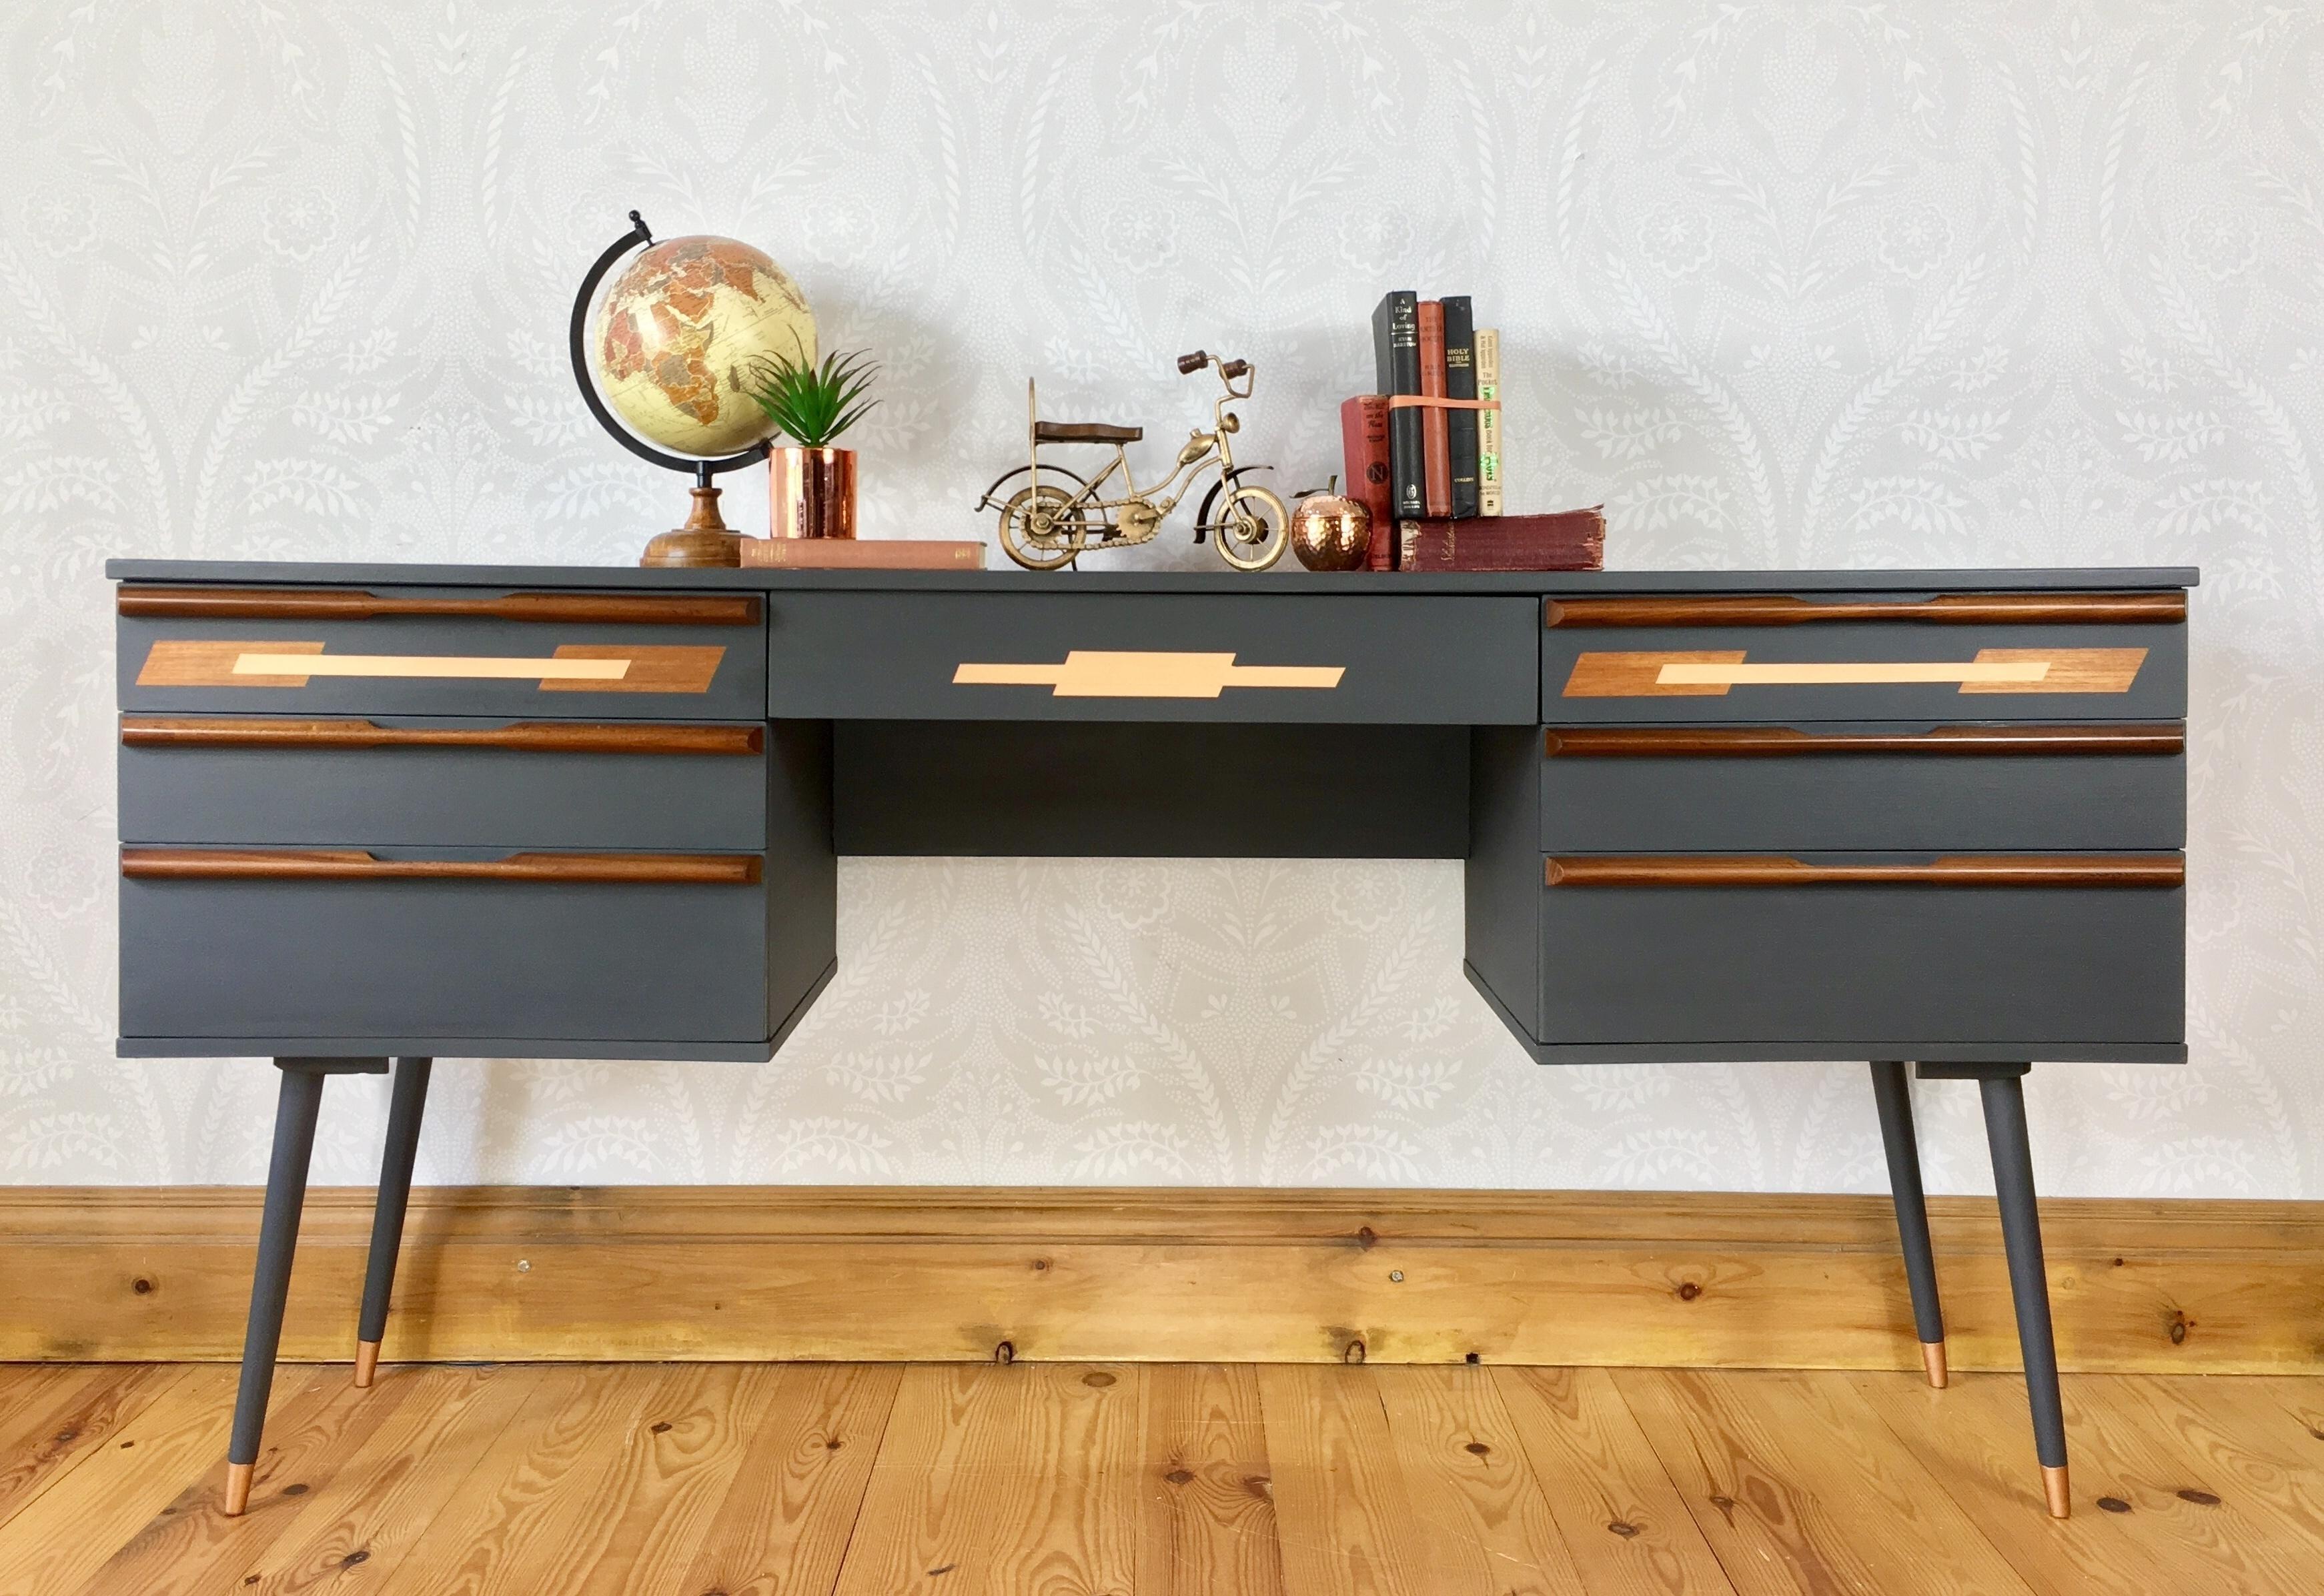 Image of: Mid Century Modern Desk By Avalon Retro Writing Desk Study Workspace Work Table Sideboard Office Desk Avalon Avalon Vinterior